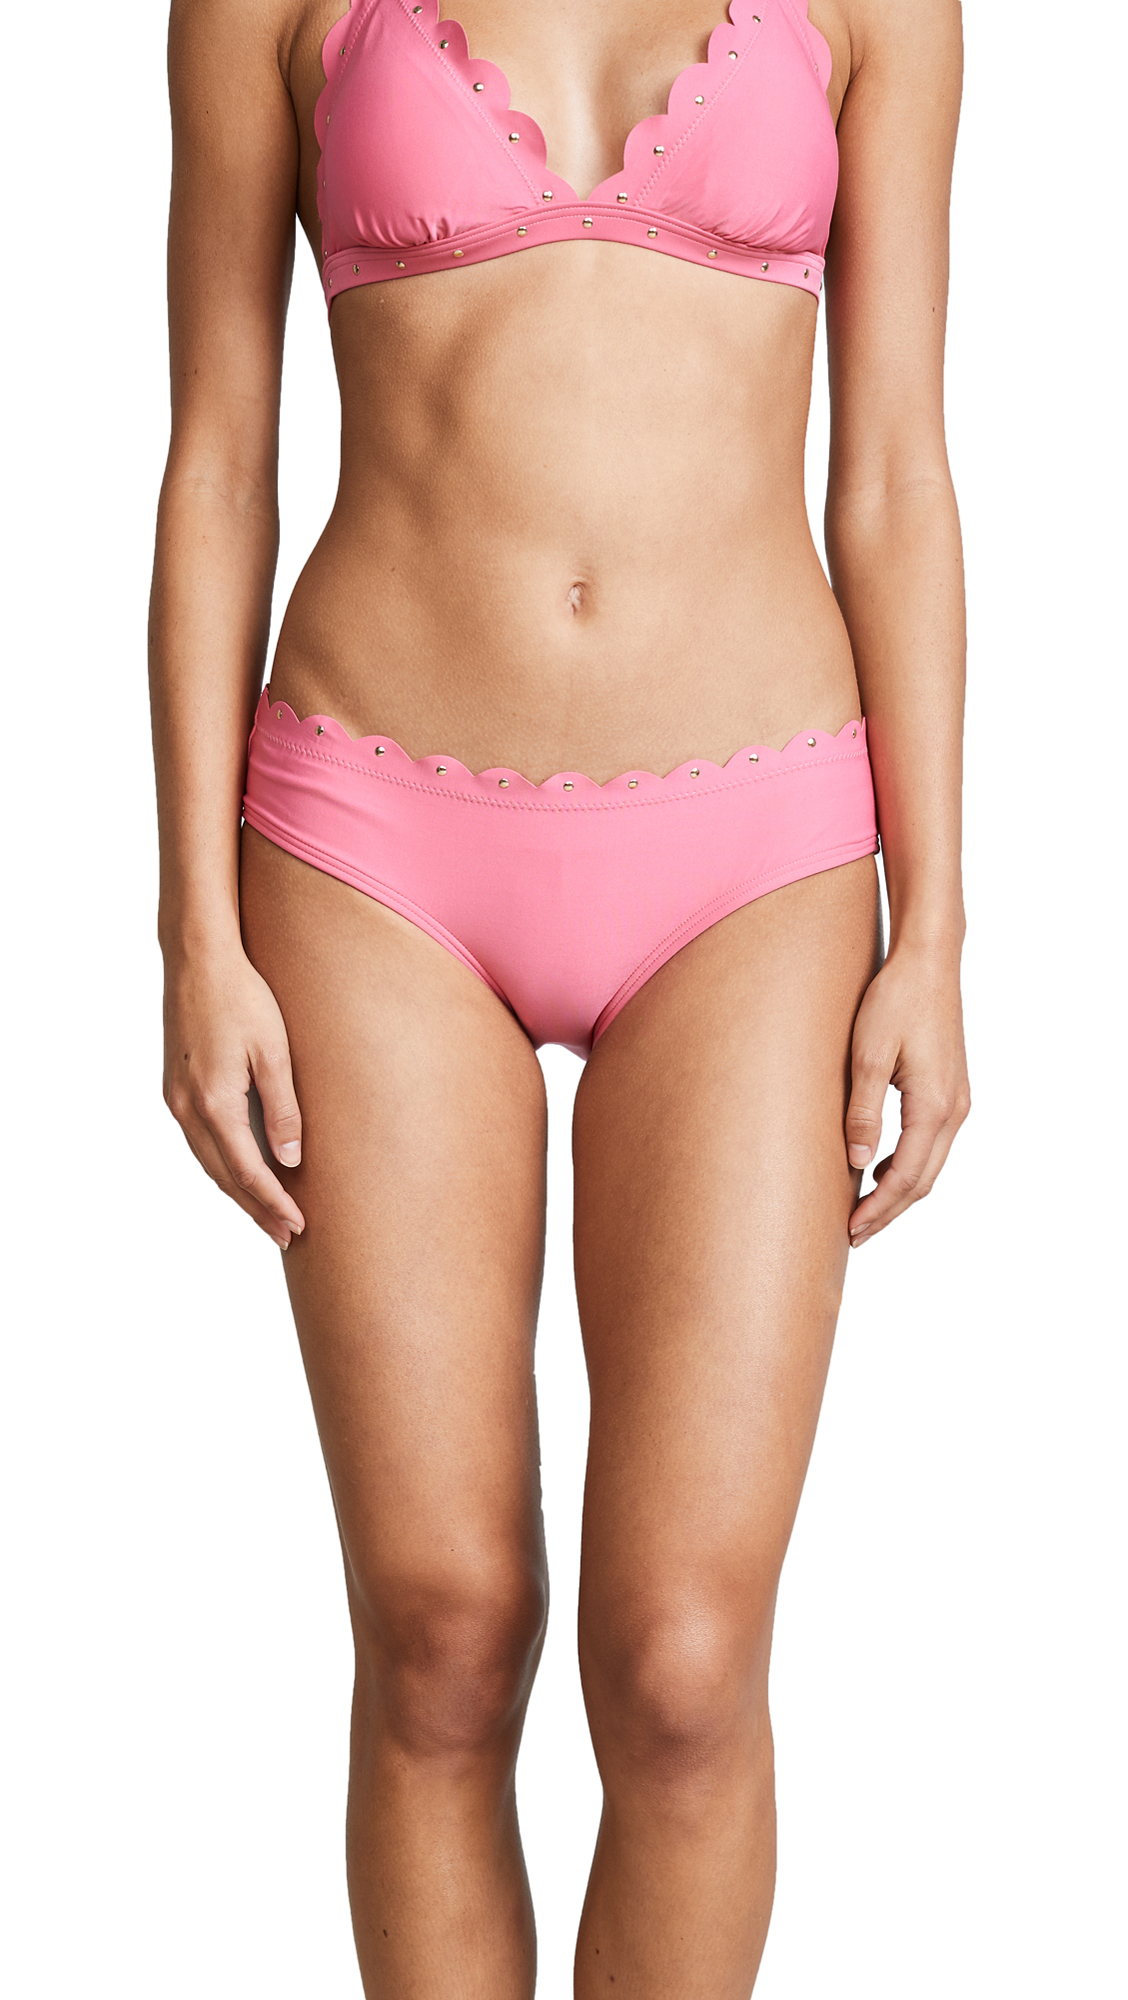 Kate Spade New York Morro Bay Scalloped Hipster Bikini Bottoms